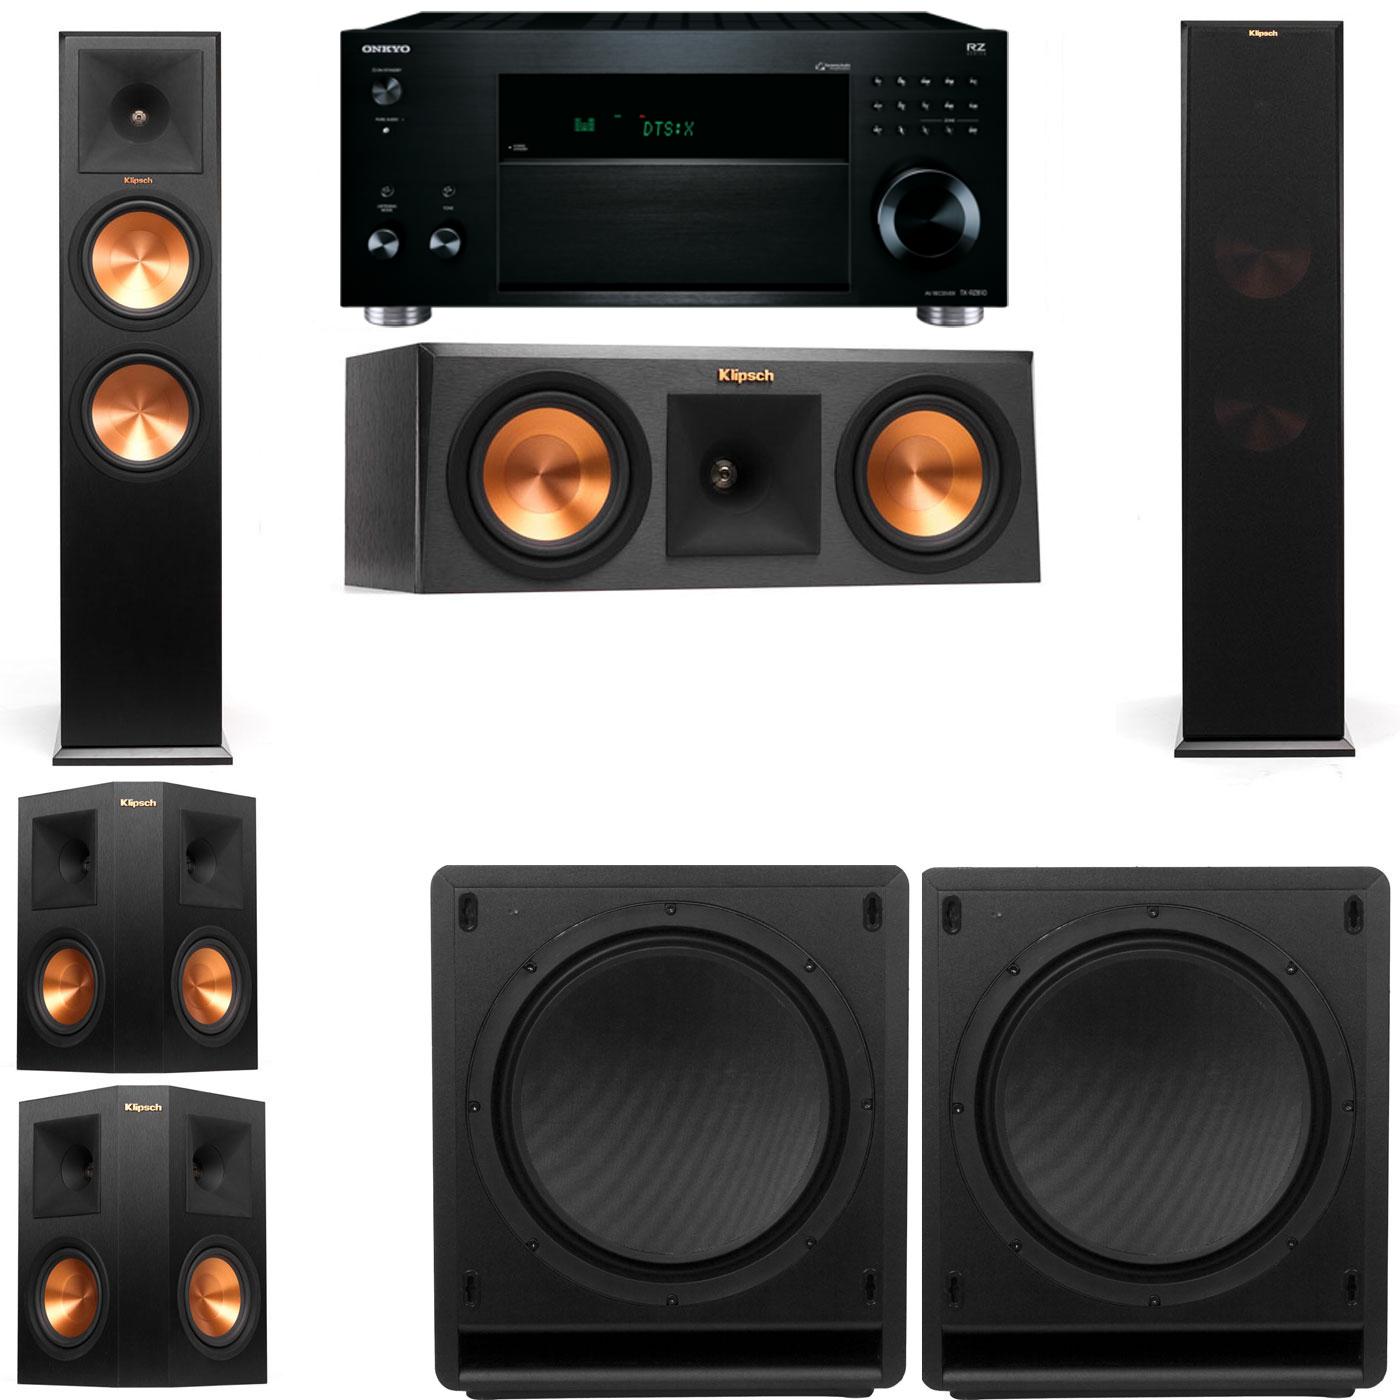 Klipsch RP-280F Tower Speakers-RP-250C-SW-112-5.2-Onkyo TX-RZ810